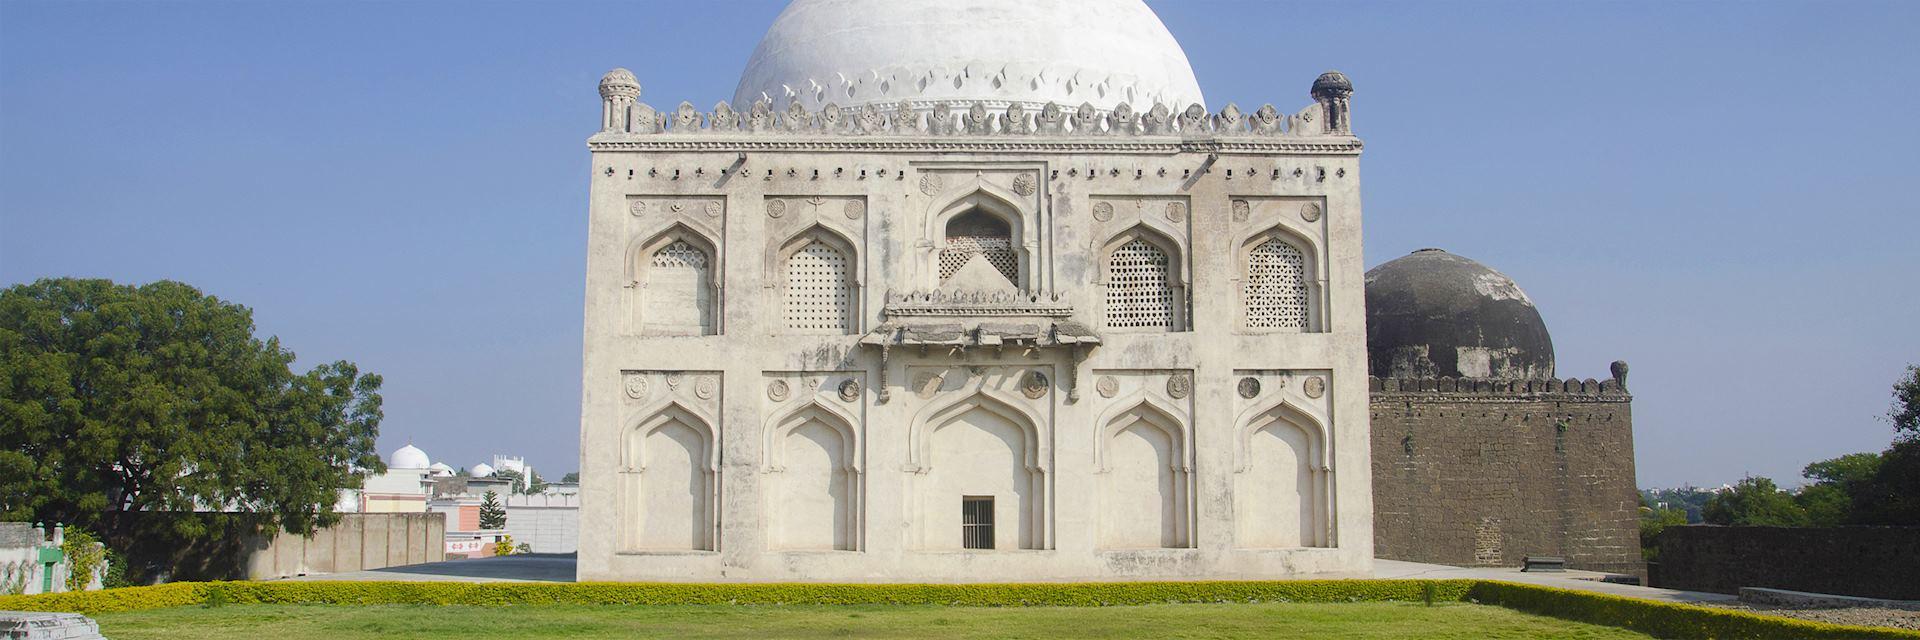 Tomb of Mujahid Shah, Gulbarga